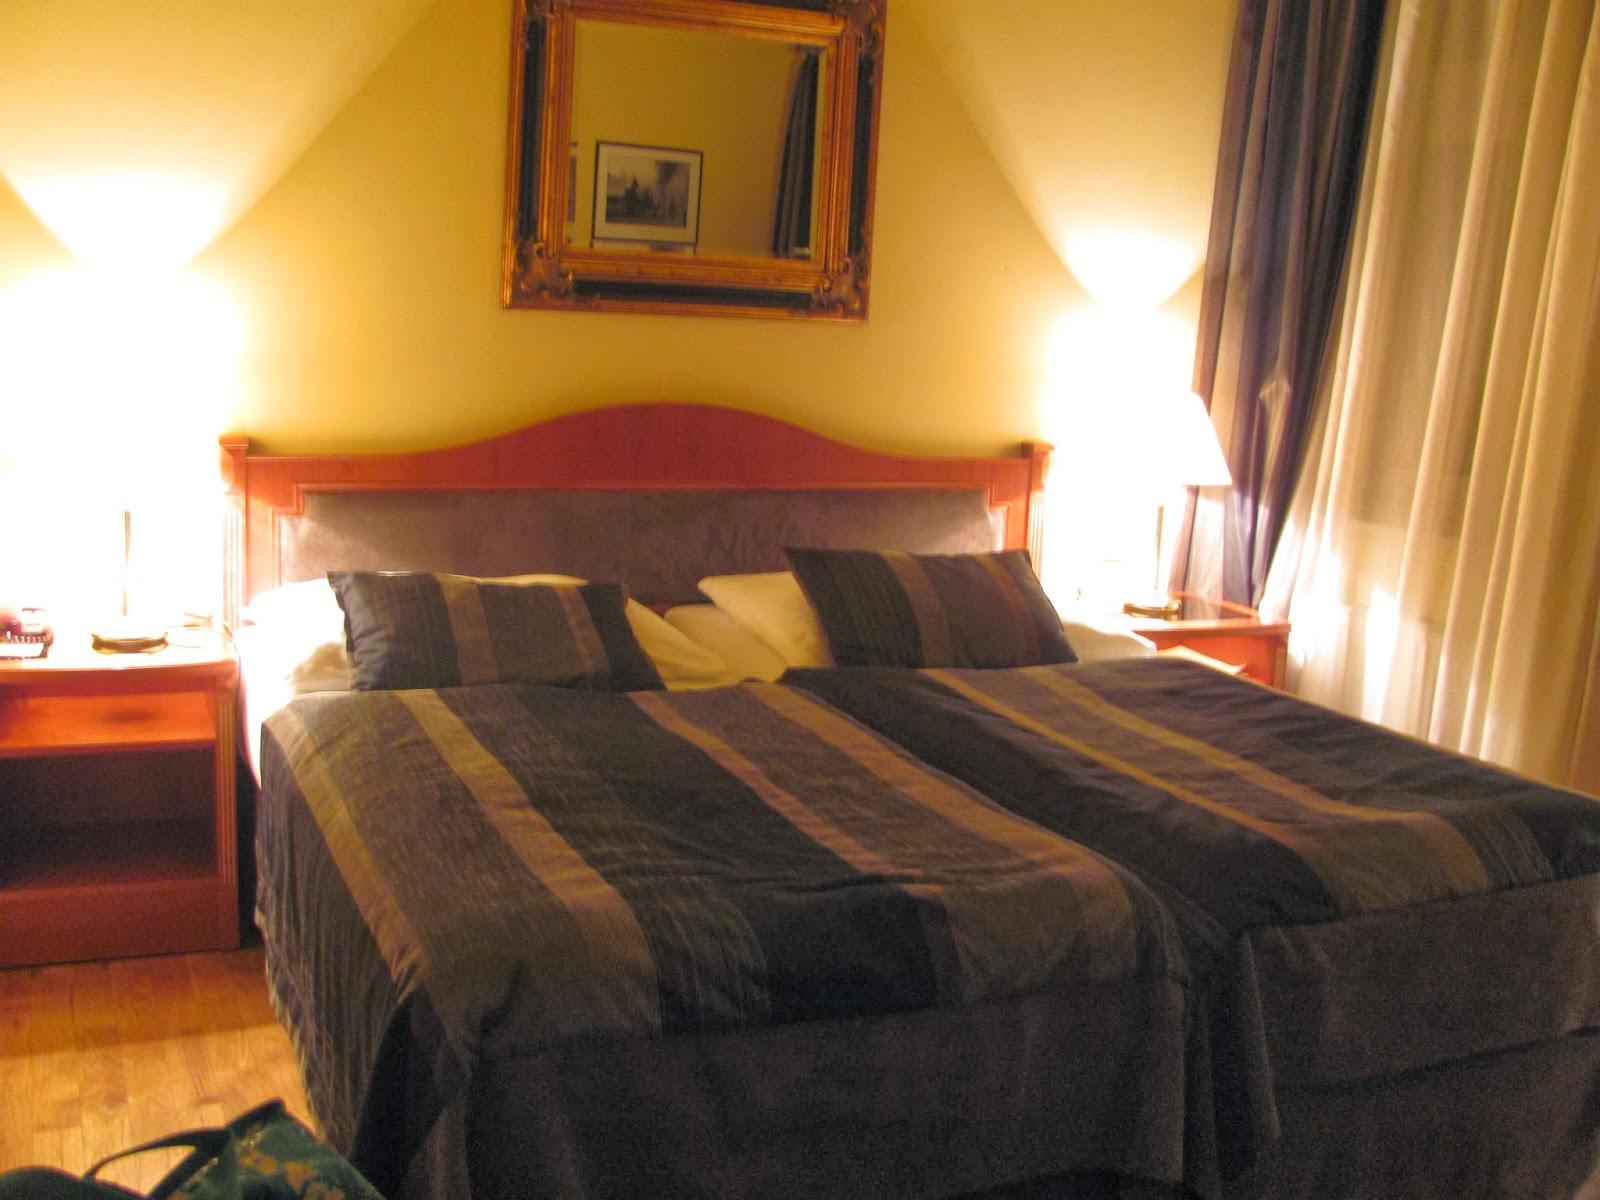 ночлег, гостиница, отель, Польша, гостиница Belvedere, номер в гостинице Belvedere, Belvedere, Hotel Belvedere